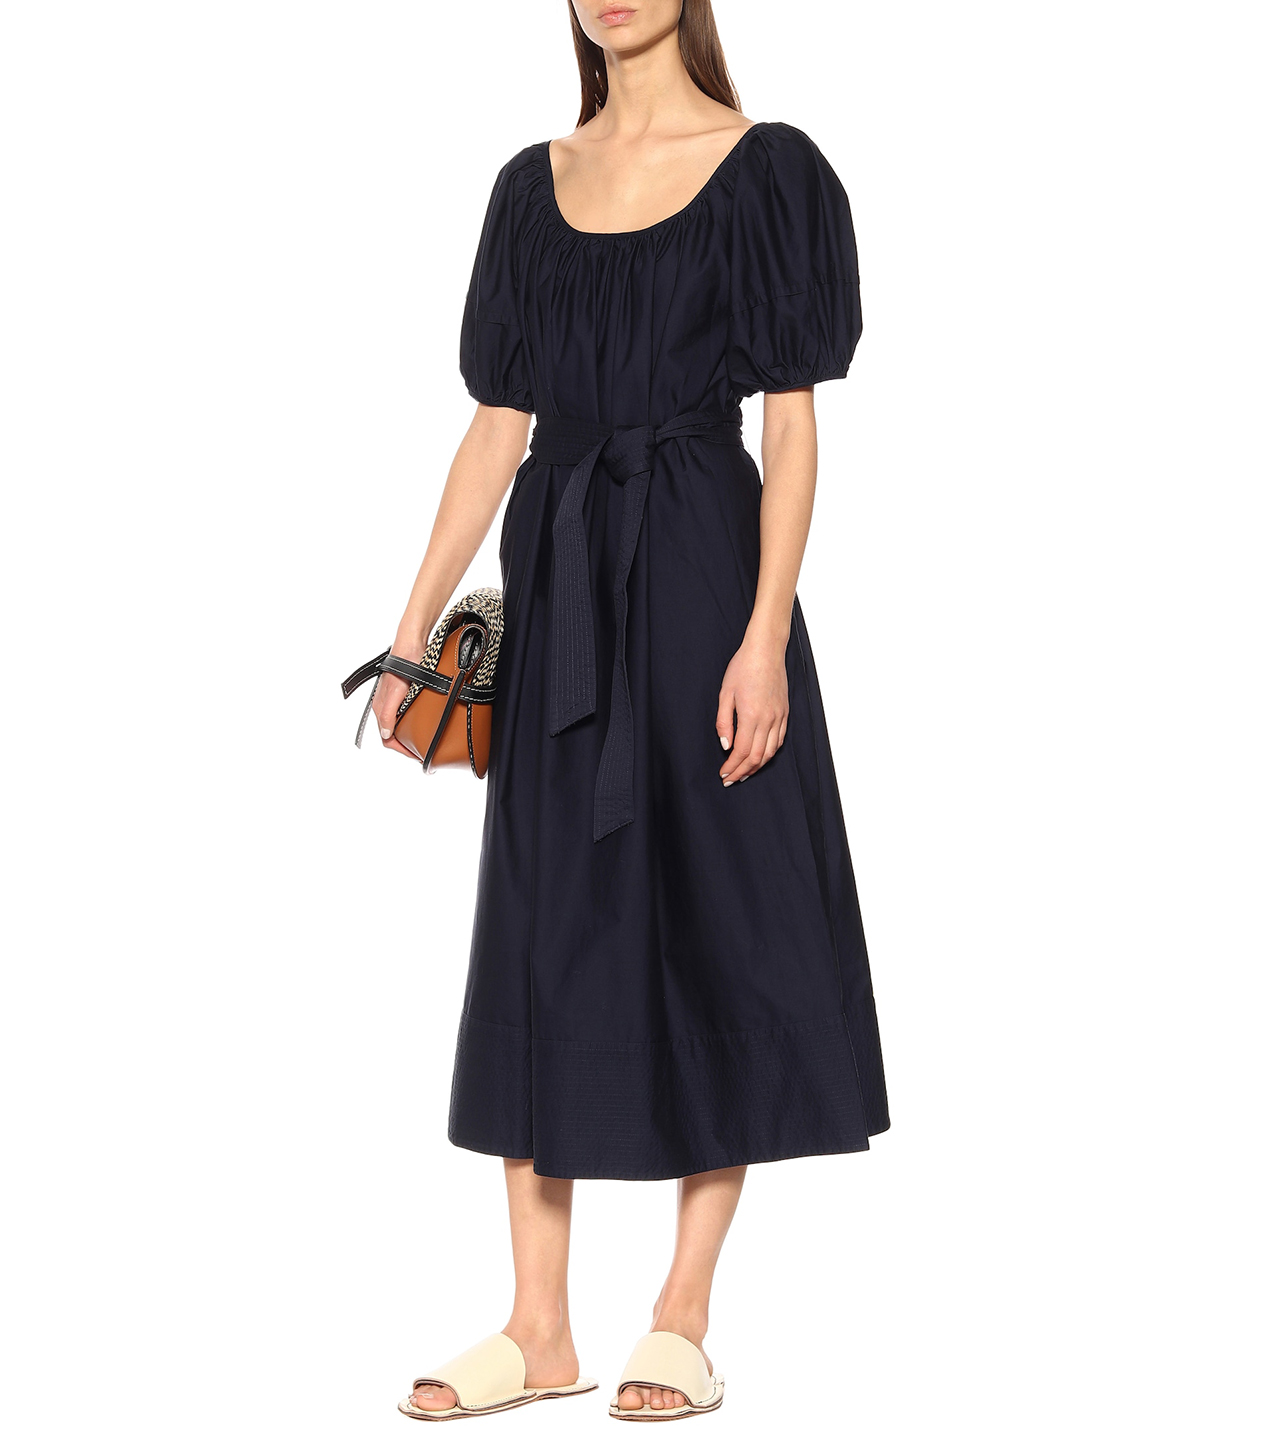 CO Midi Dress